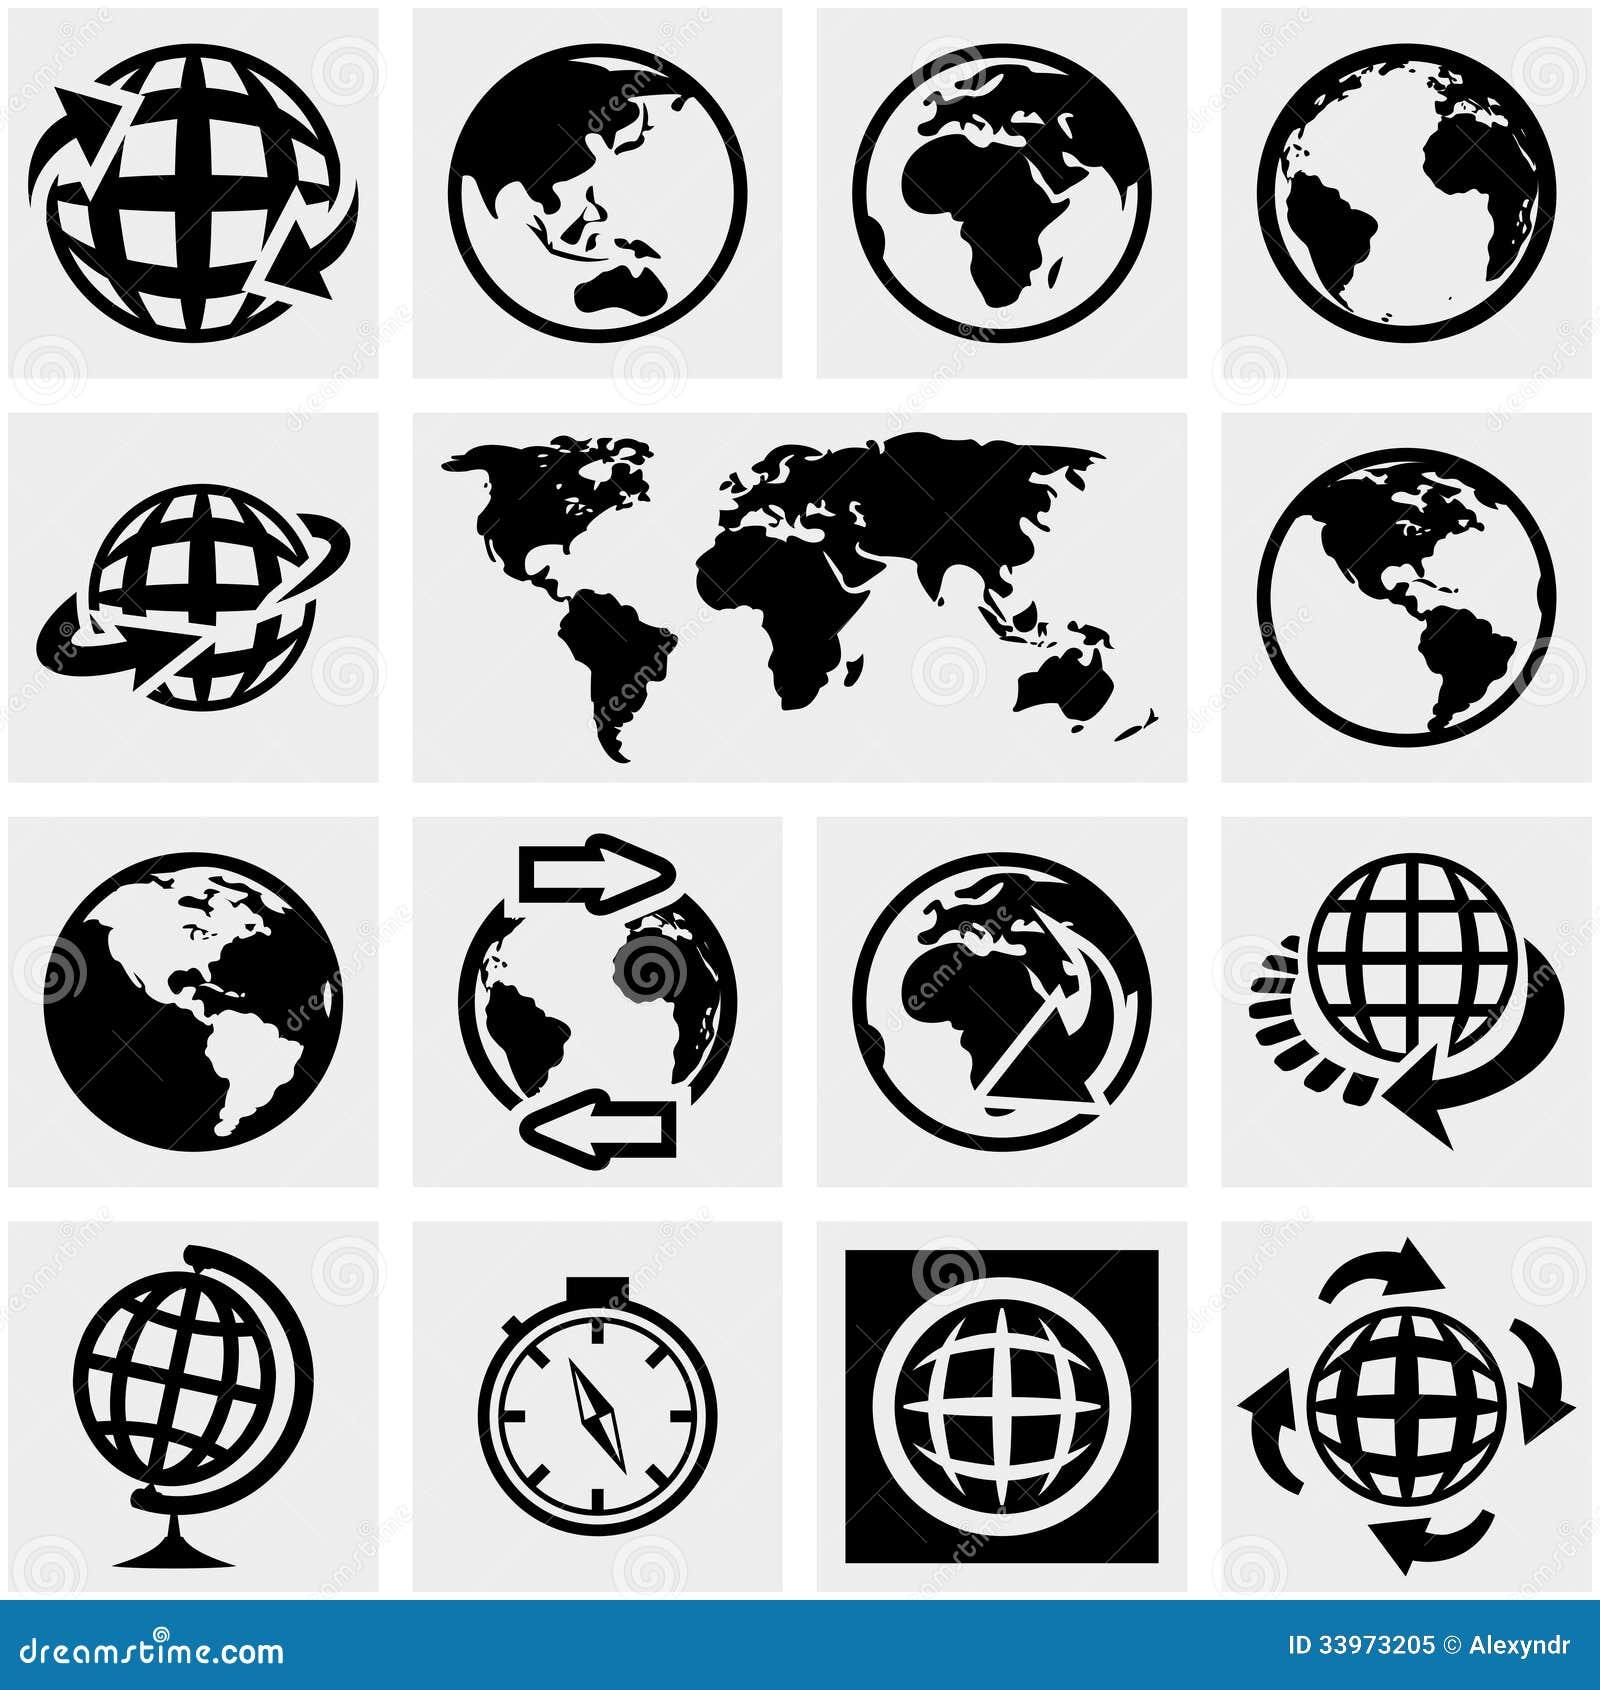 Globe Earth Vector Icons Set On Gray. Royalty Free Stock ...